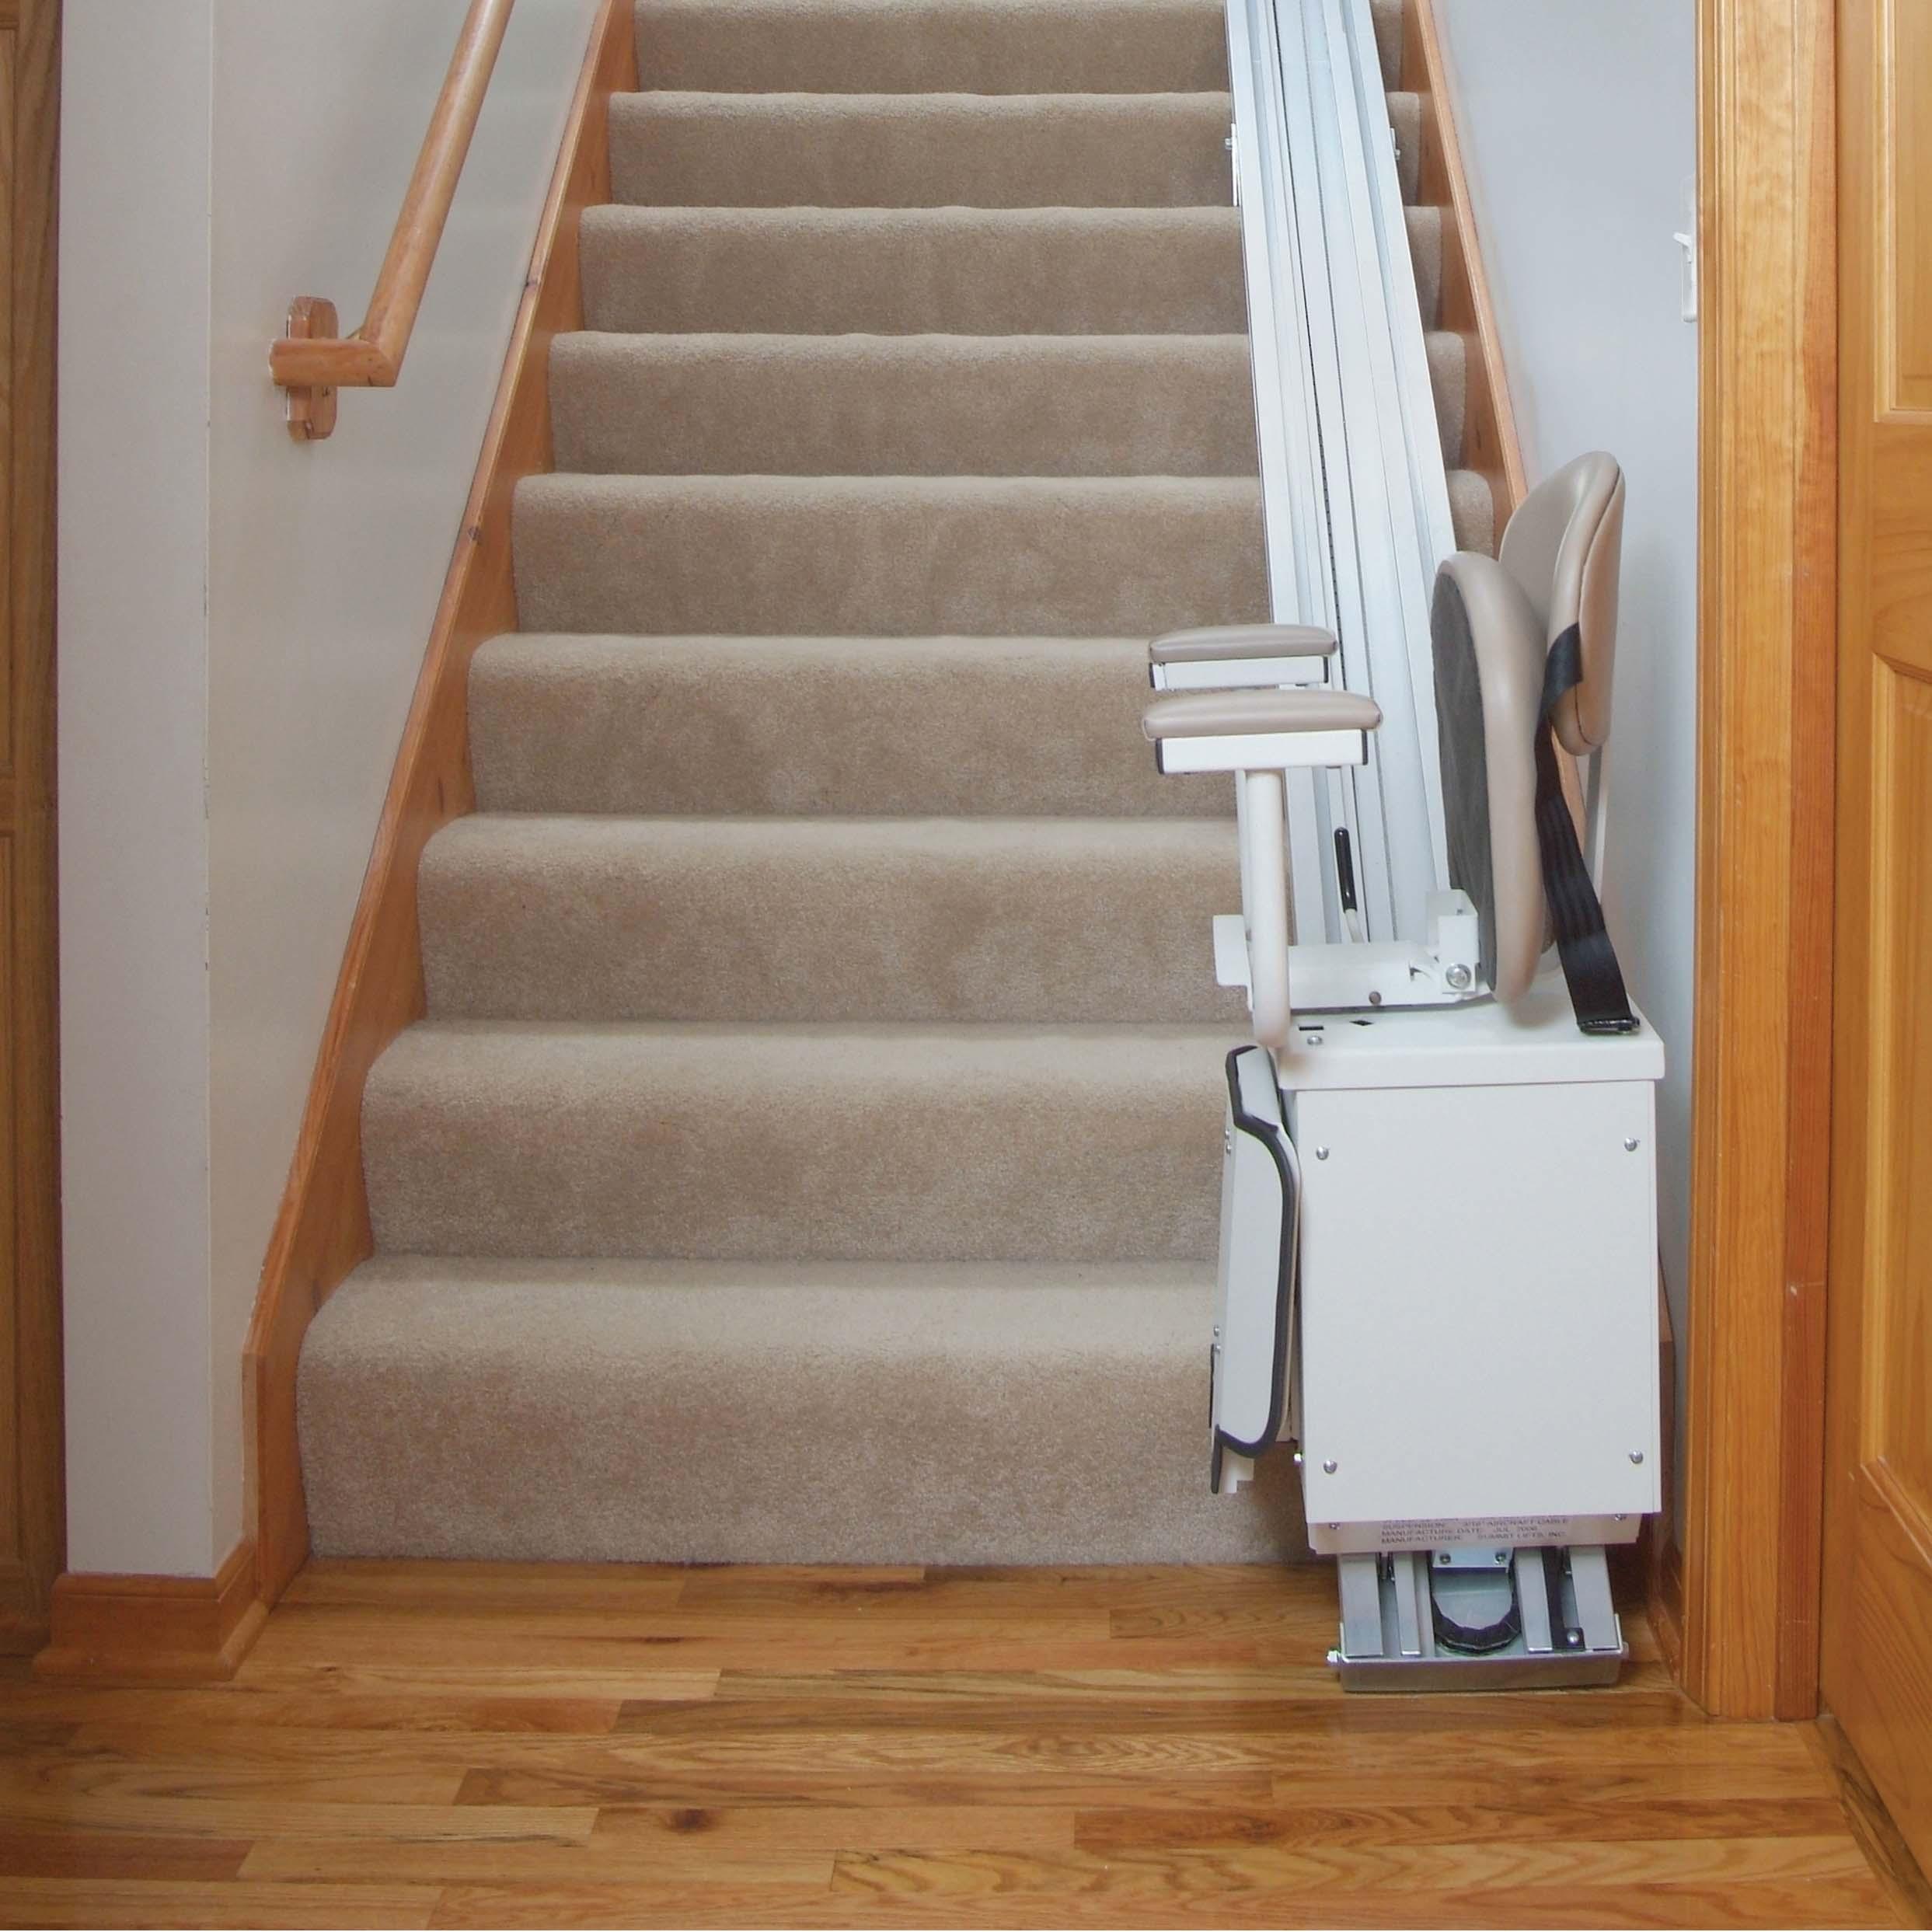 Harmar Summit Stair Lift SL350AC HomeAccessProducts